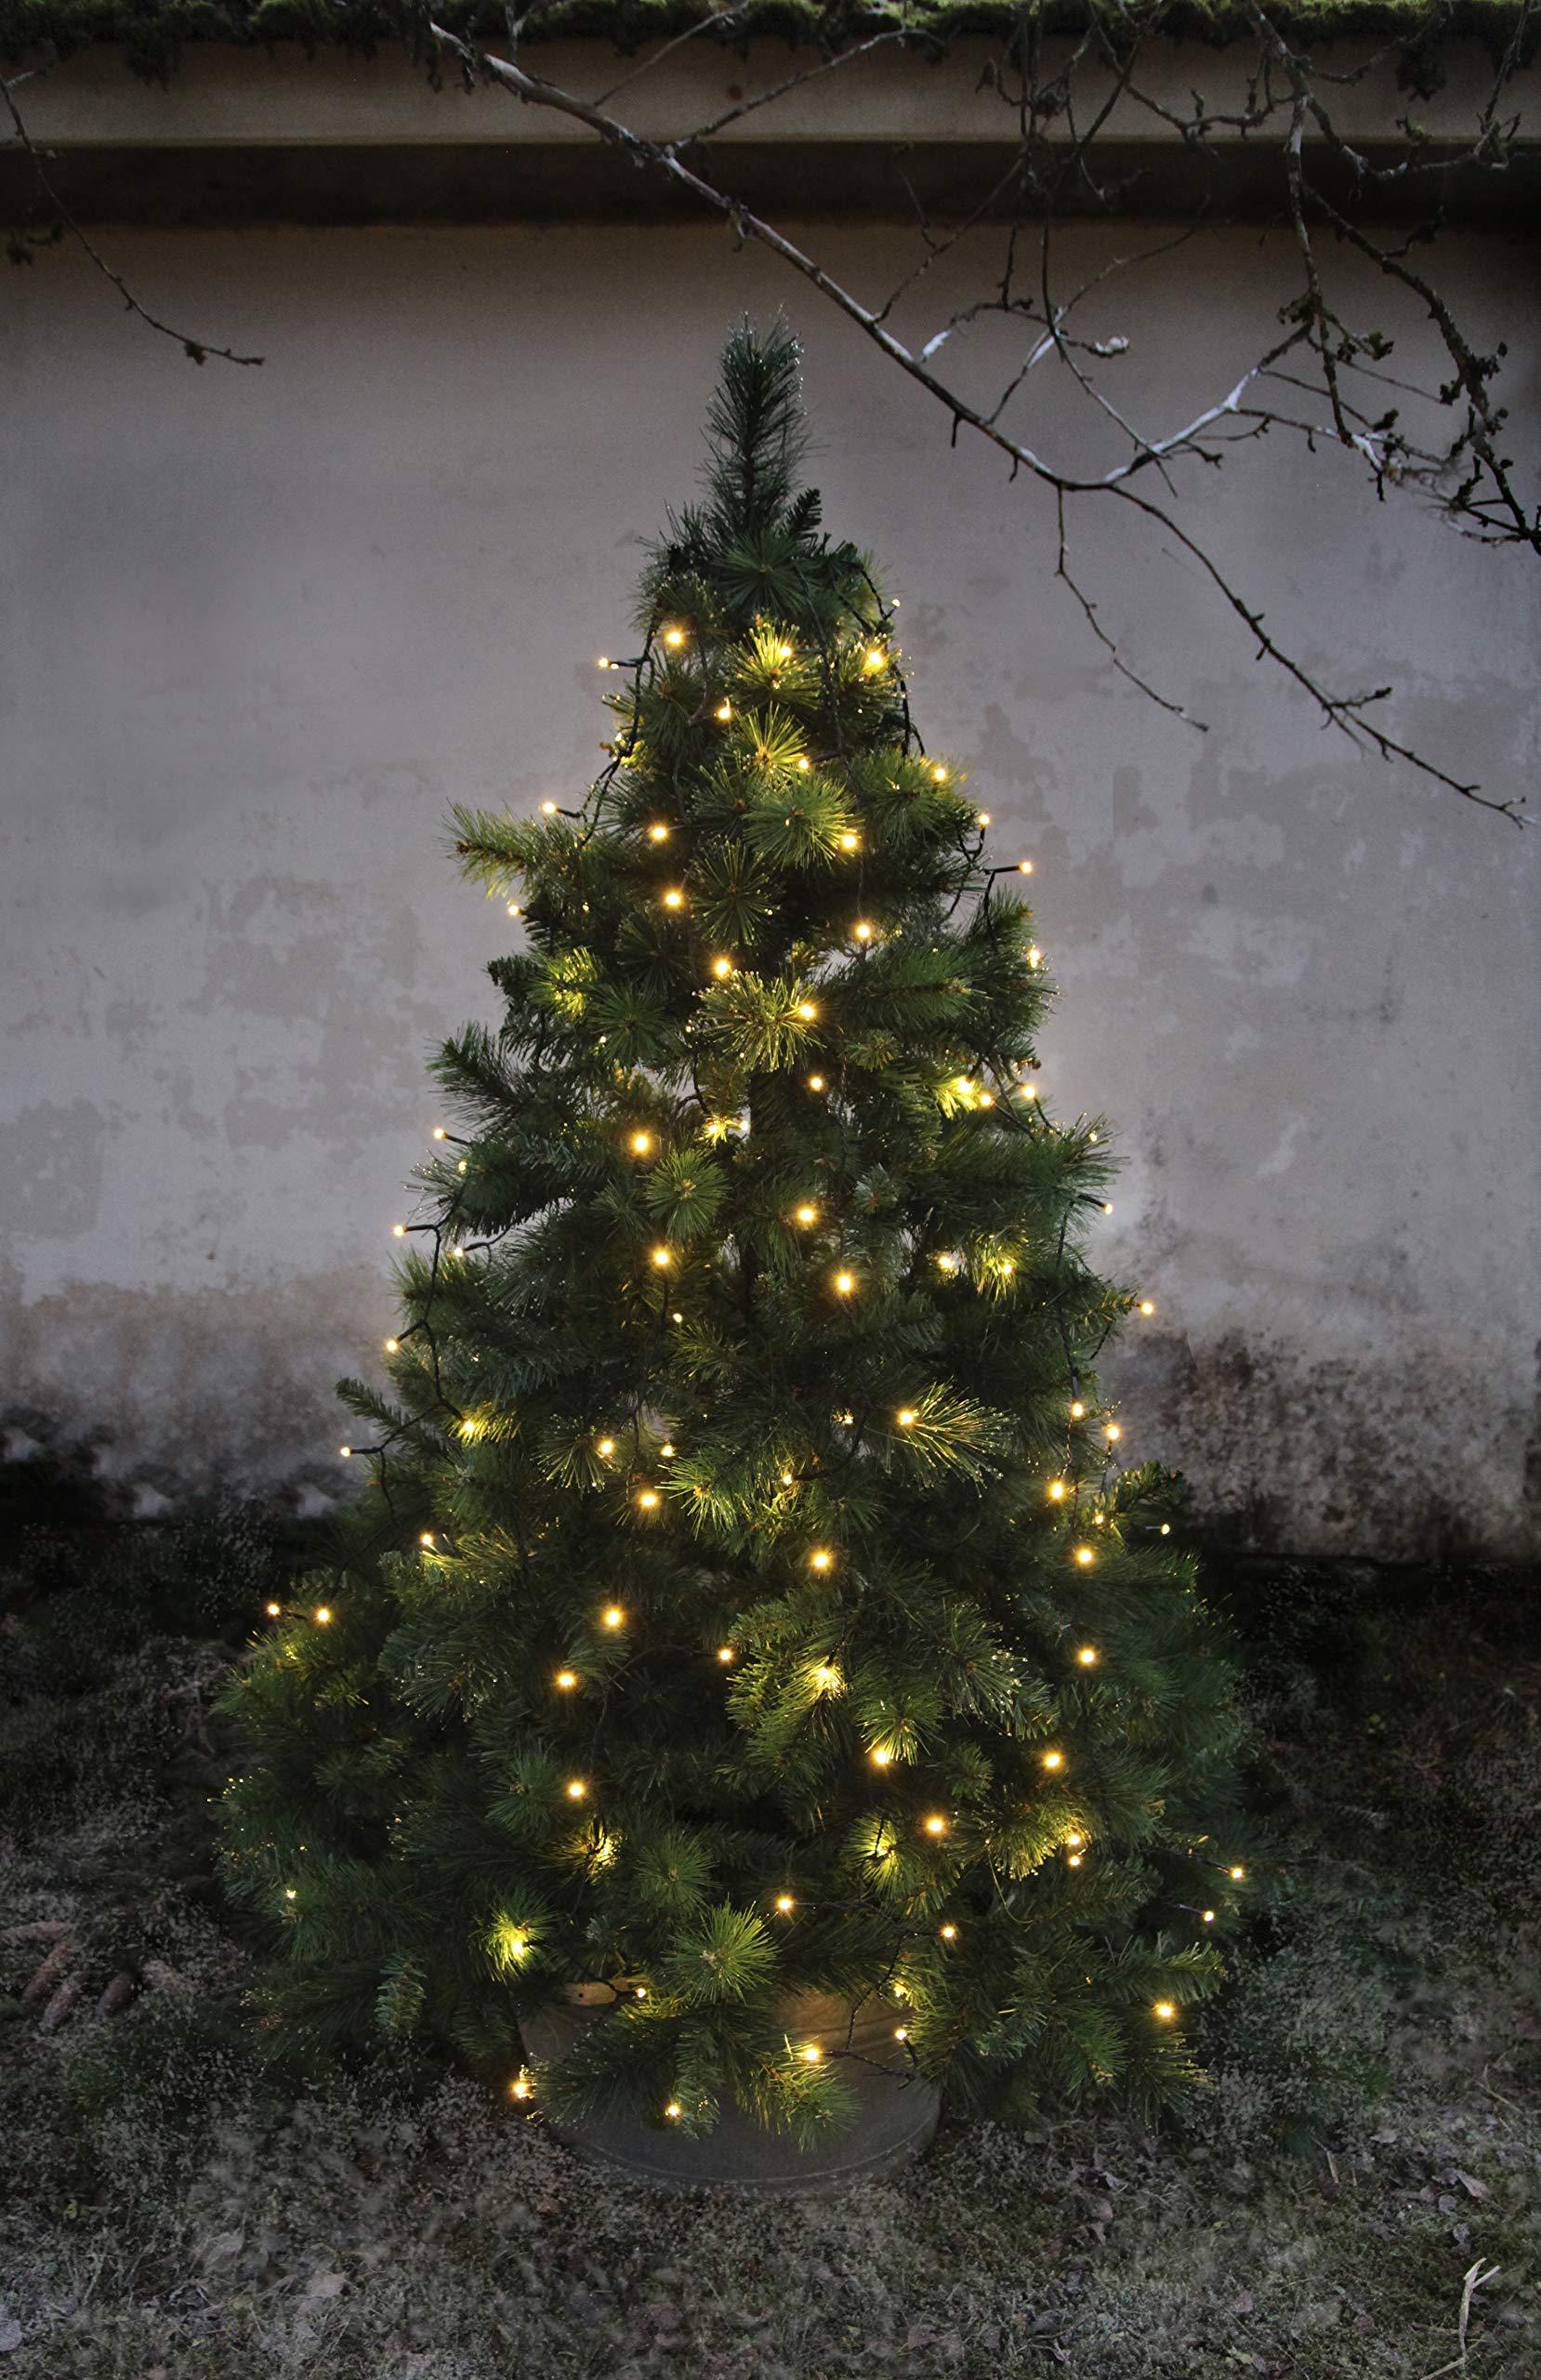 LED-Baumvorhang-160-teilig-Farbe-warm-white-Kabel-schwarz-8-Strnge-fr-ca-180-200-cm-Bume-outdoor-mit-Trafo